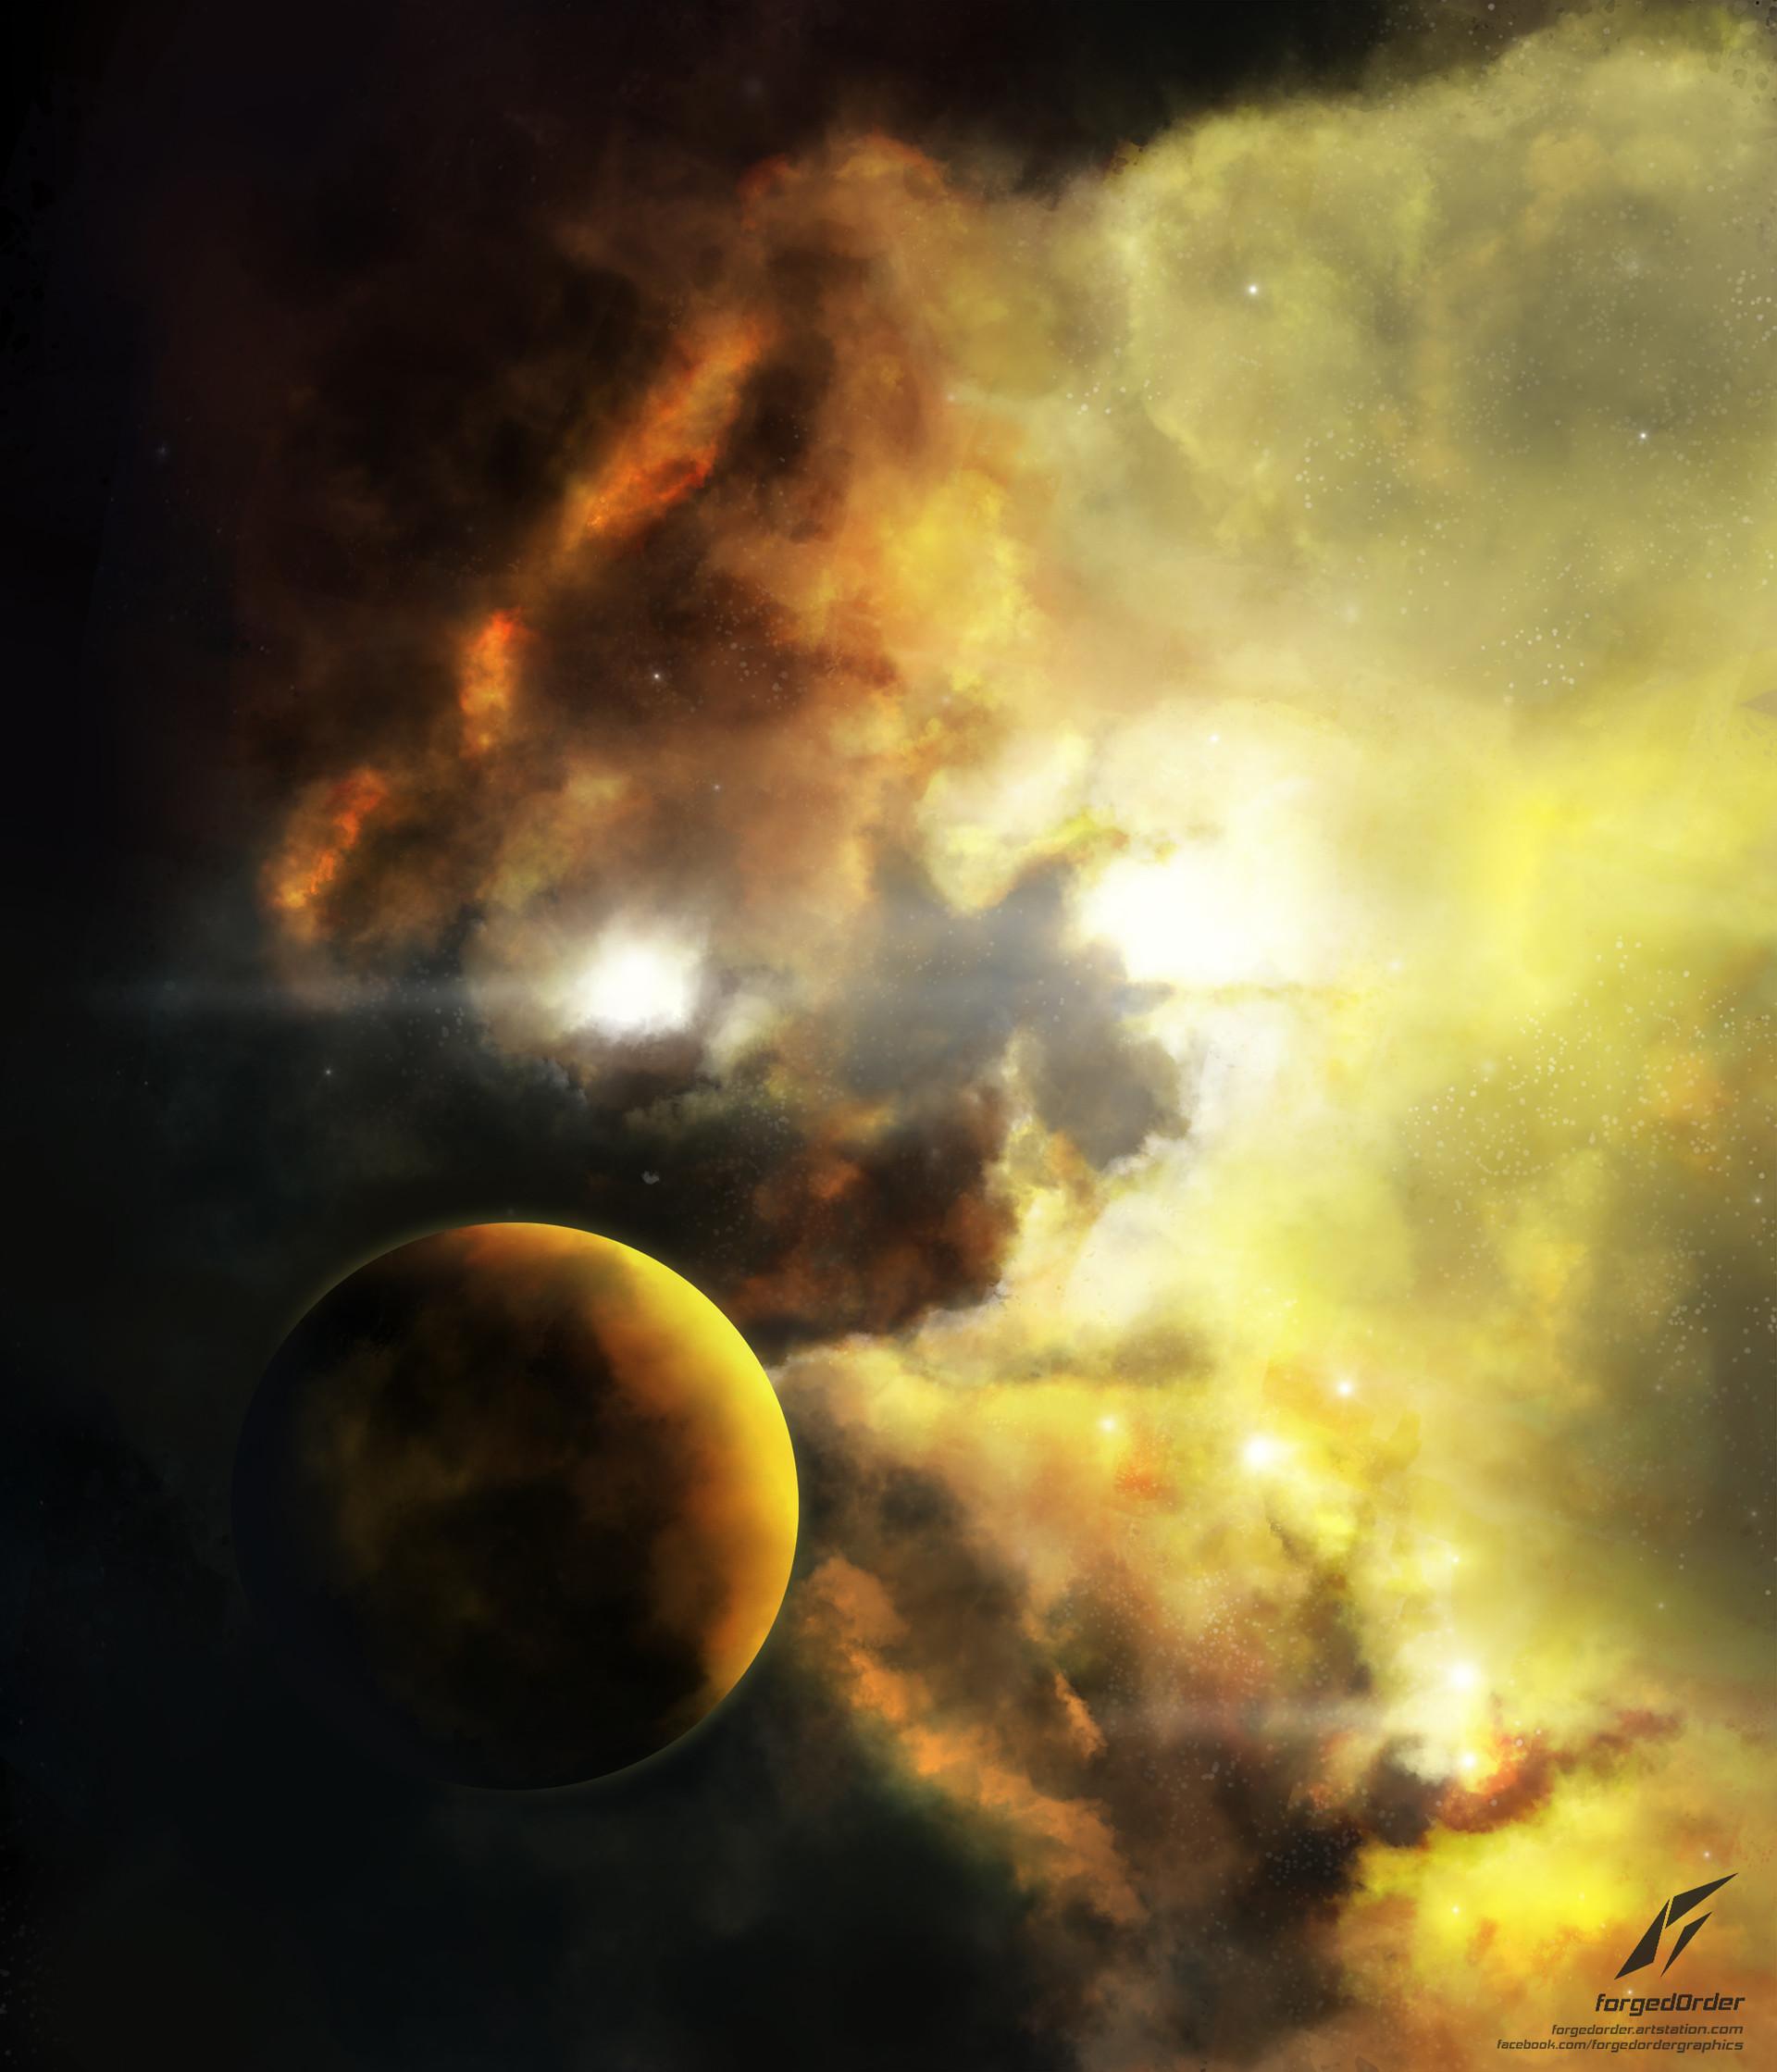 Attila gallik forgedorder nebula